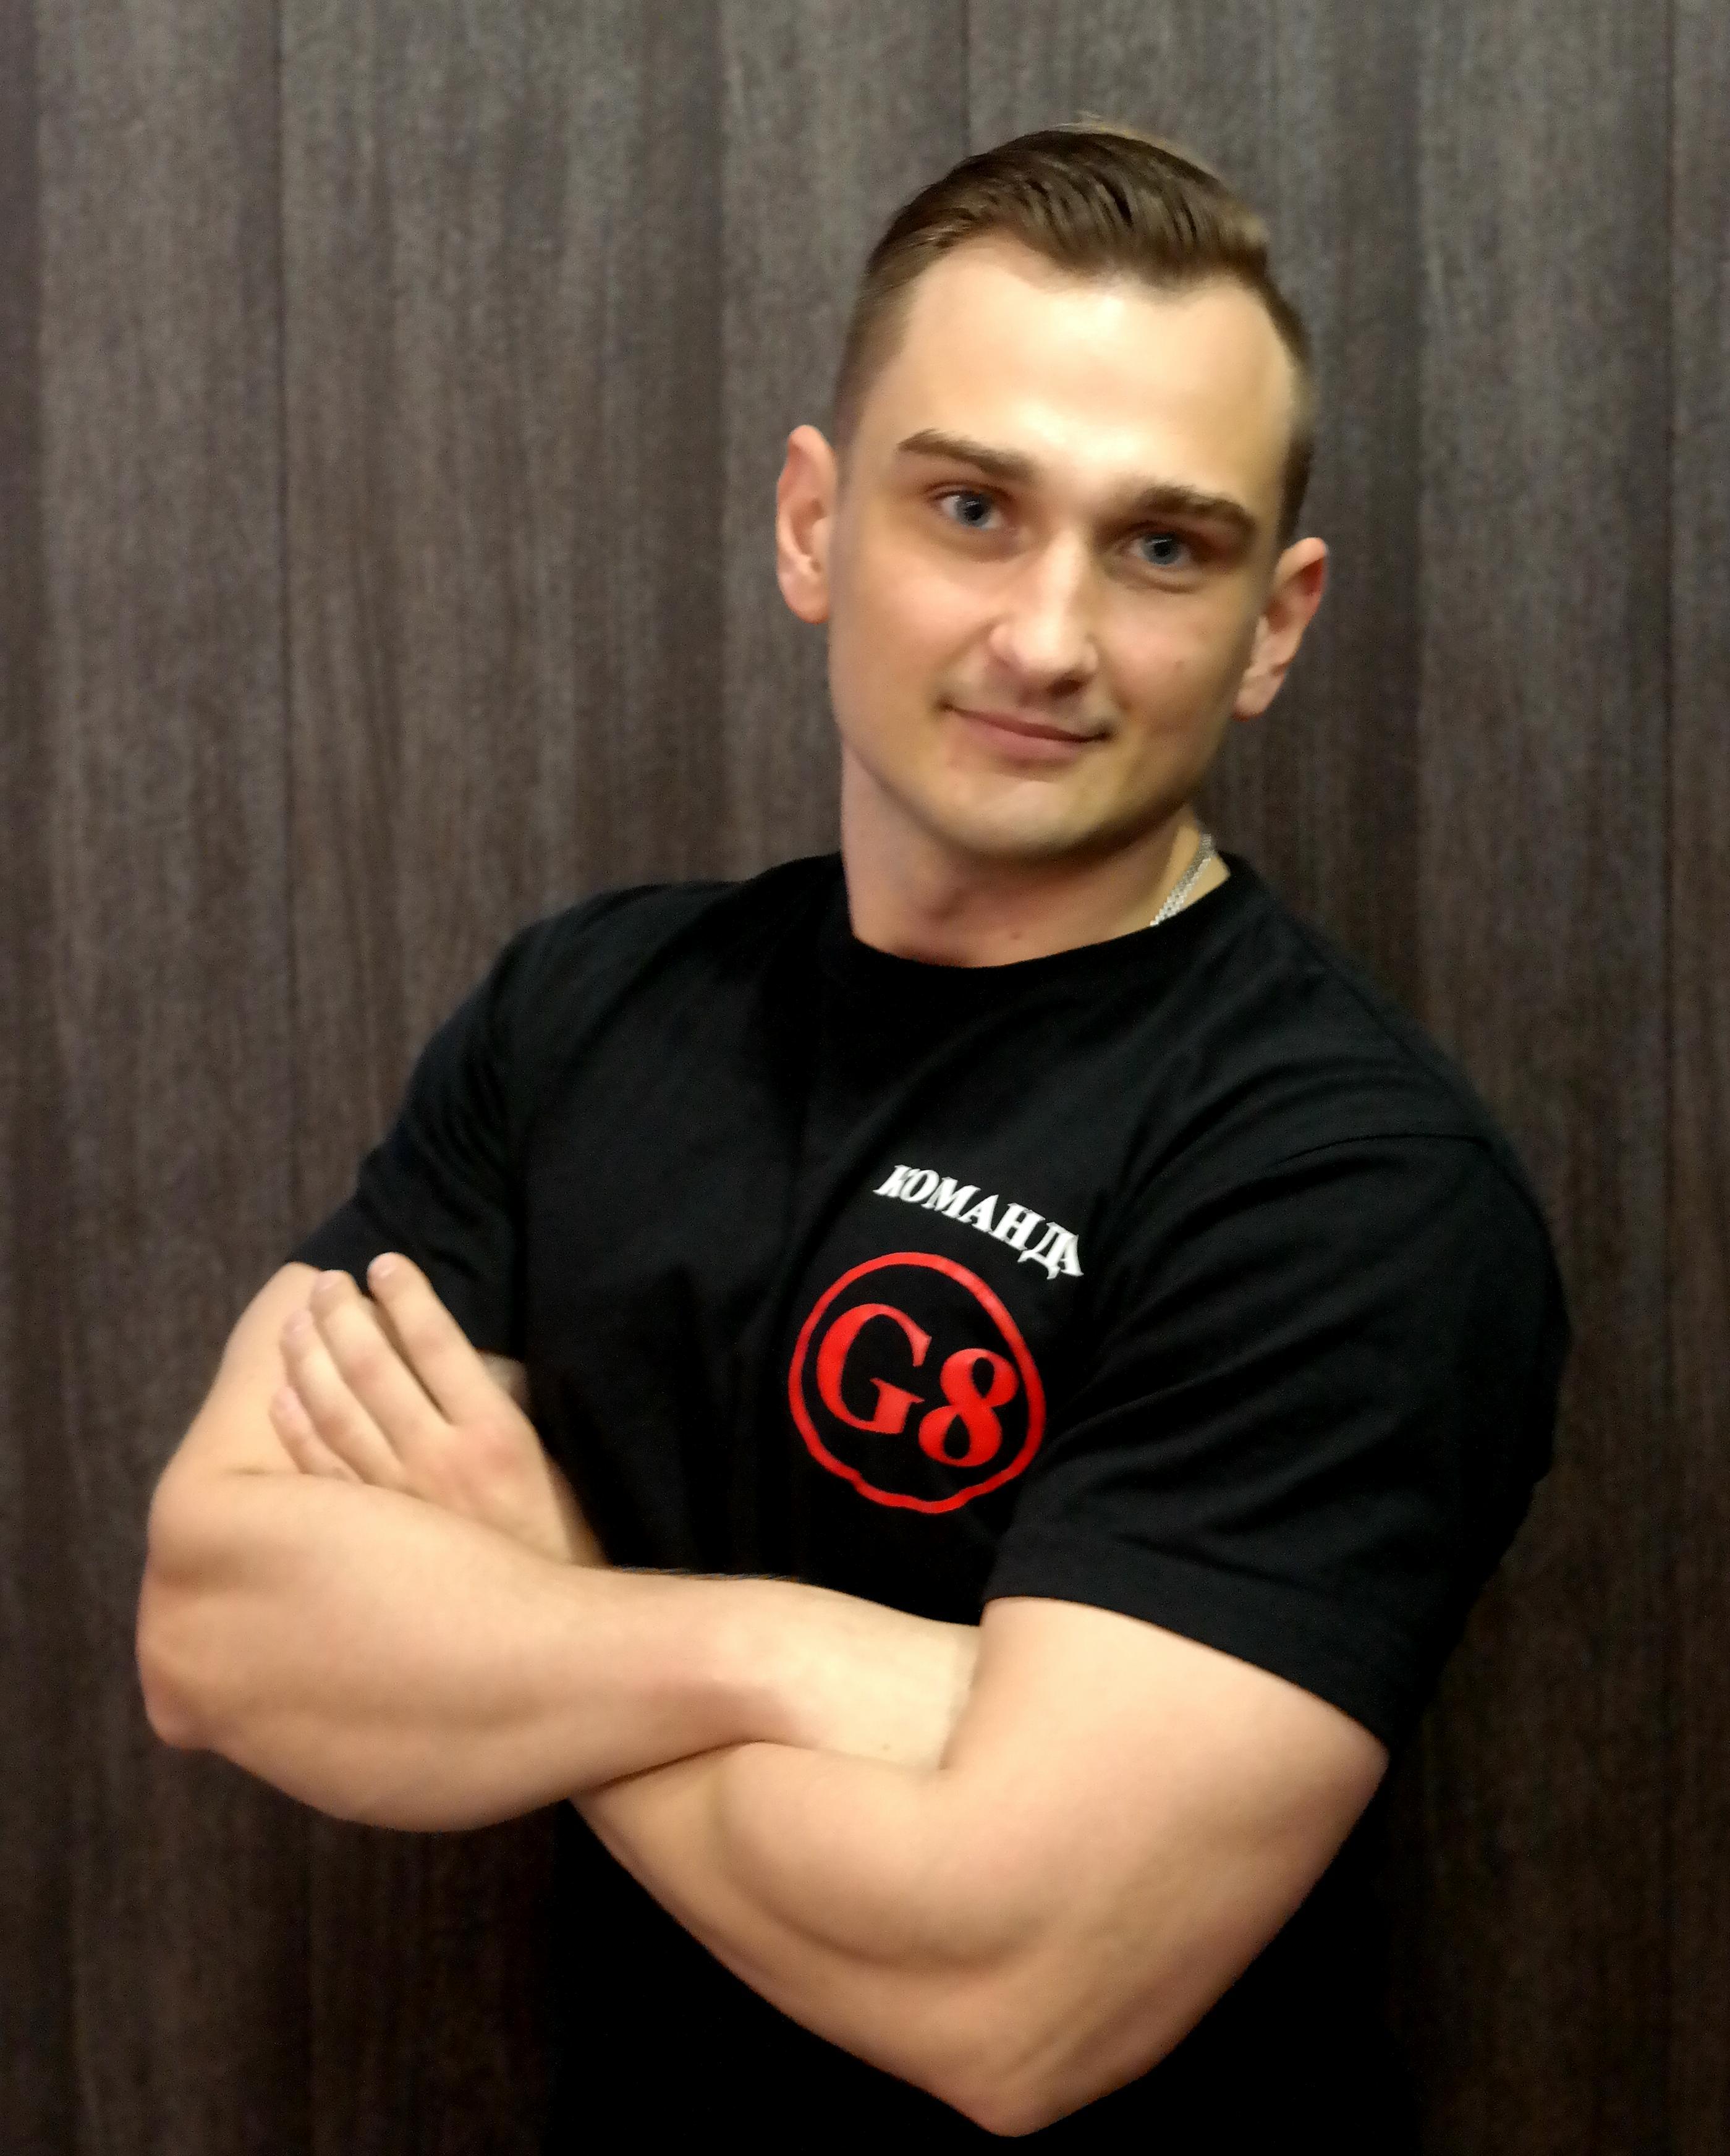 Команда G8: ДМИТРИЙ СКВОРЦОВ